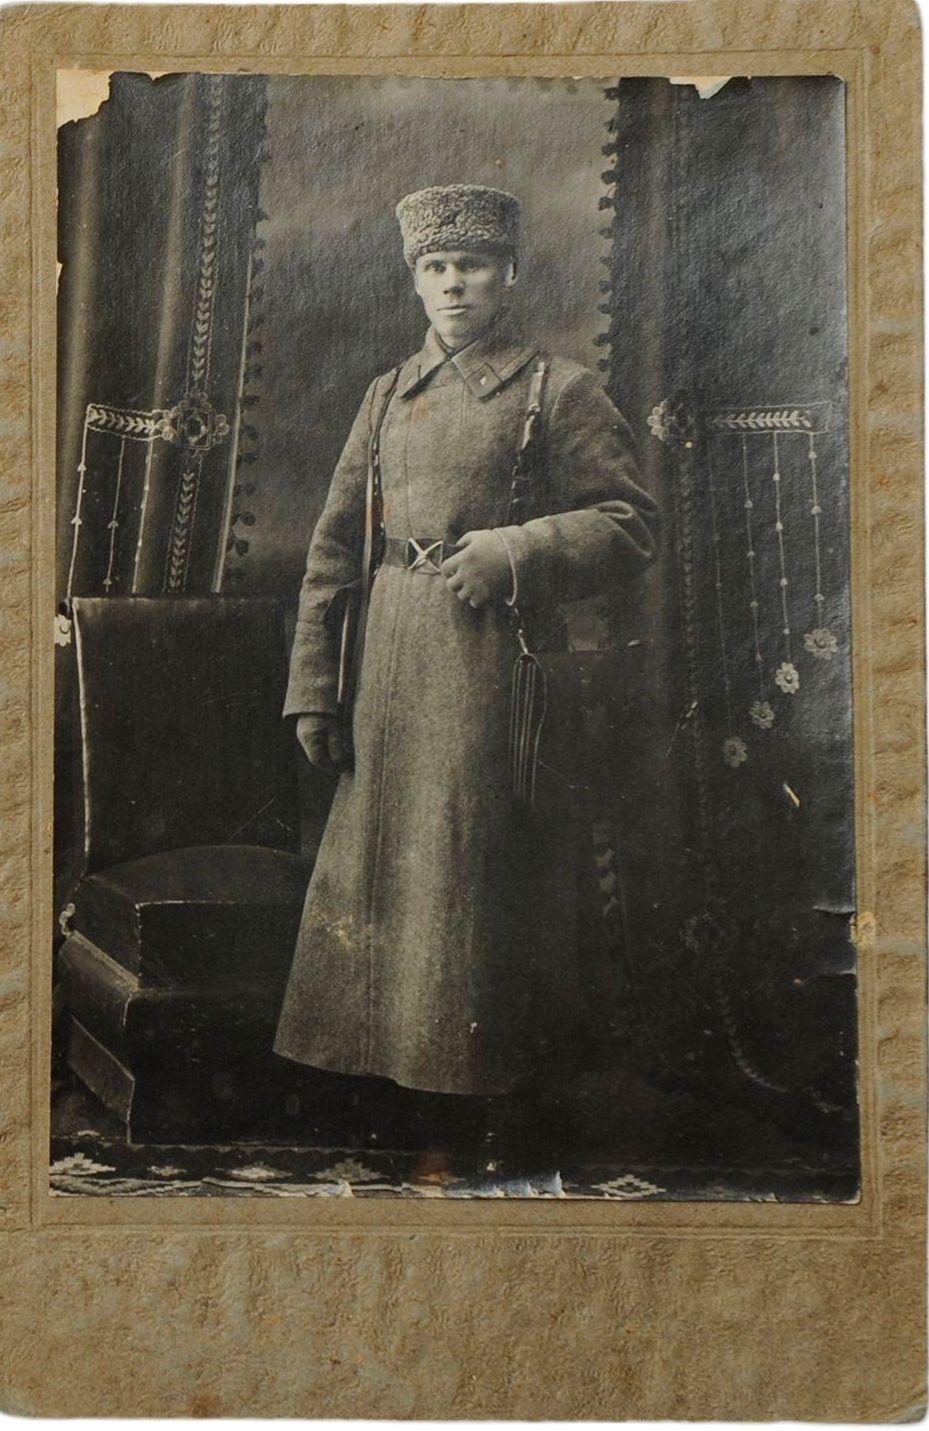 1930-е  Фото начальника горотдела милиции адмотдела исполкома